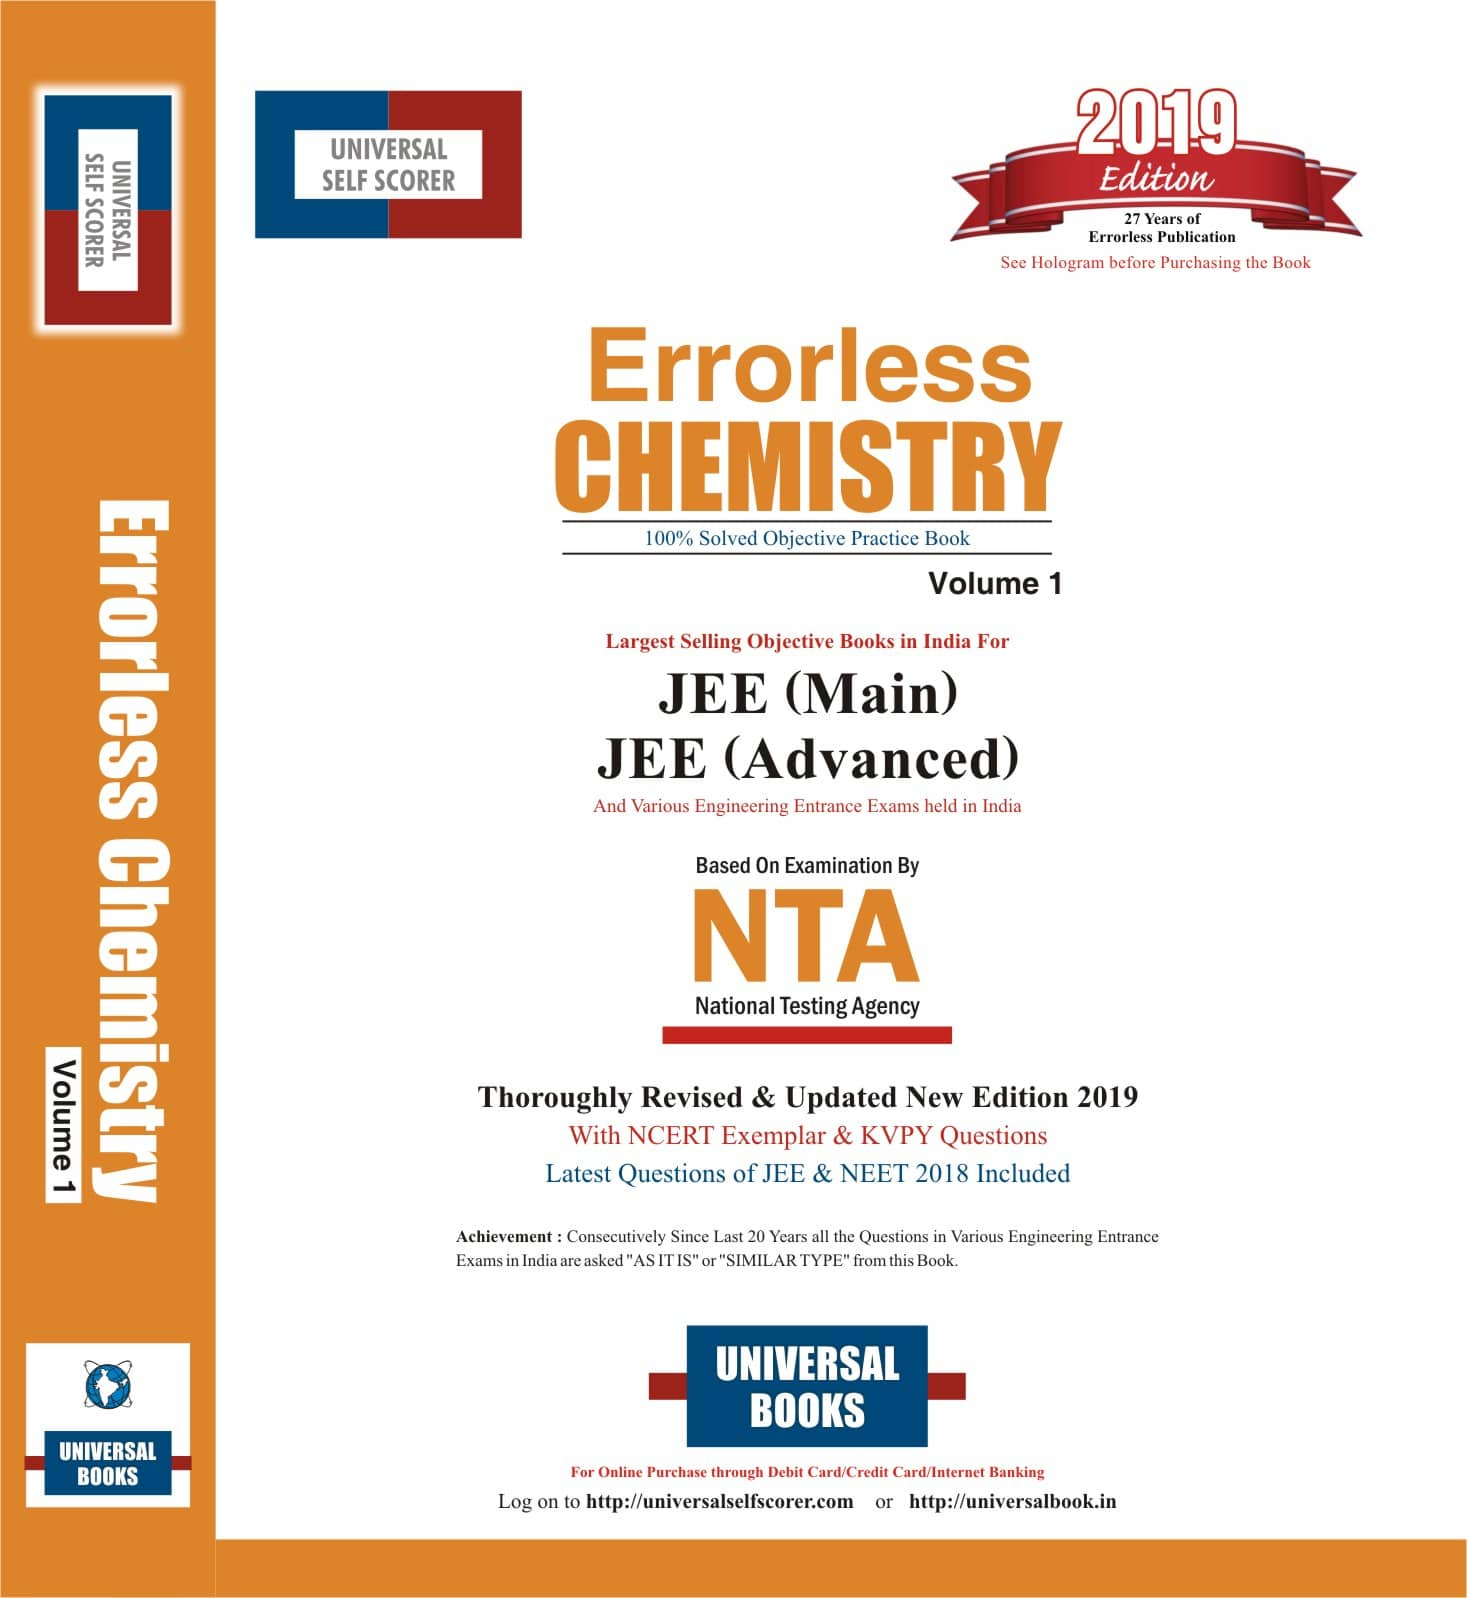 Errorless Chemistry JEE Mains & JEE Advance (Vol 1 & 2) - 2019